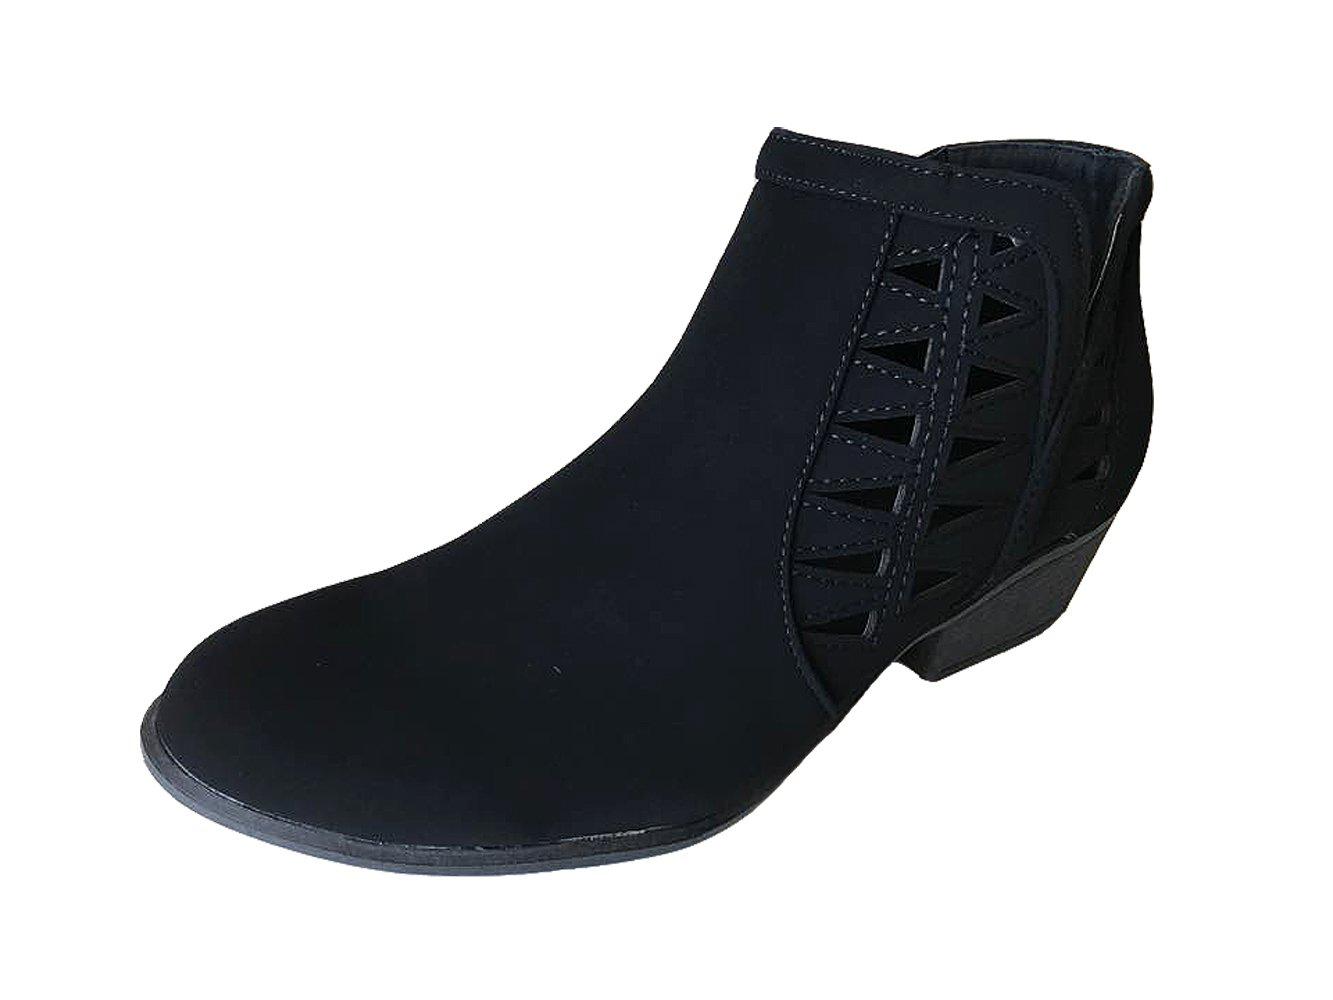 Top Moda Women's Fashion Bootie (8, Black)